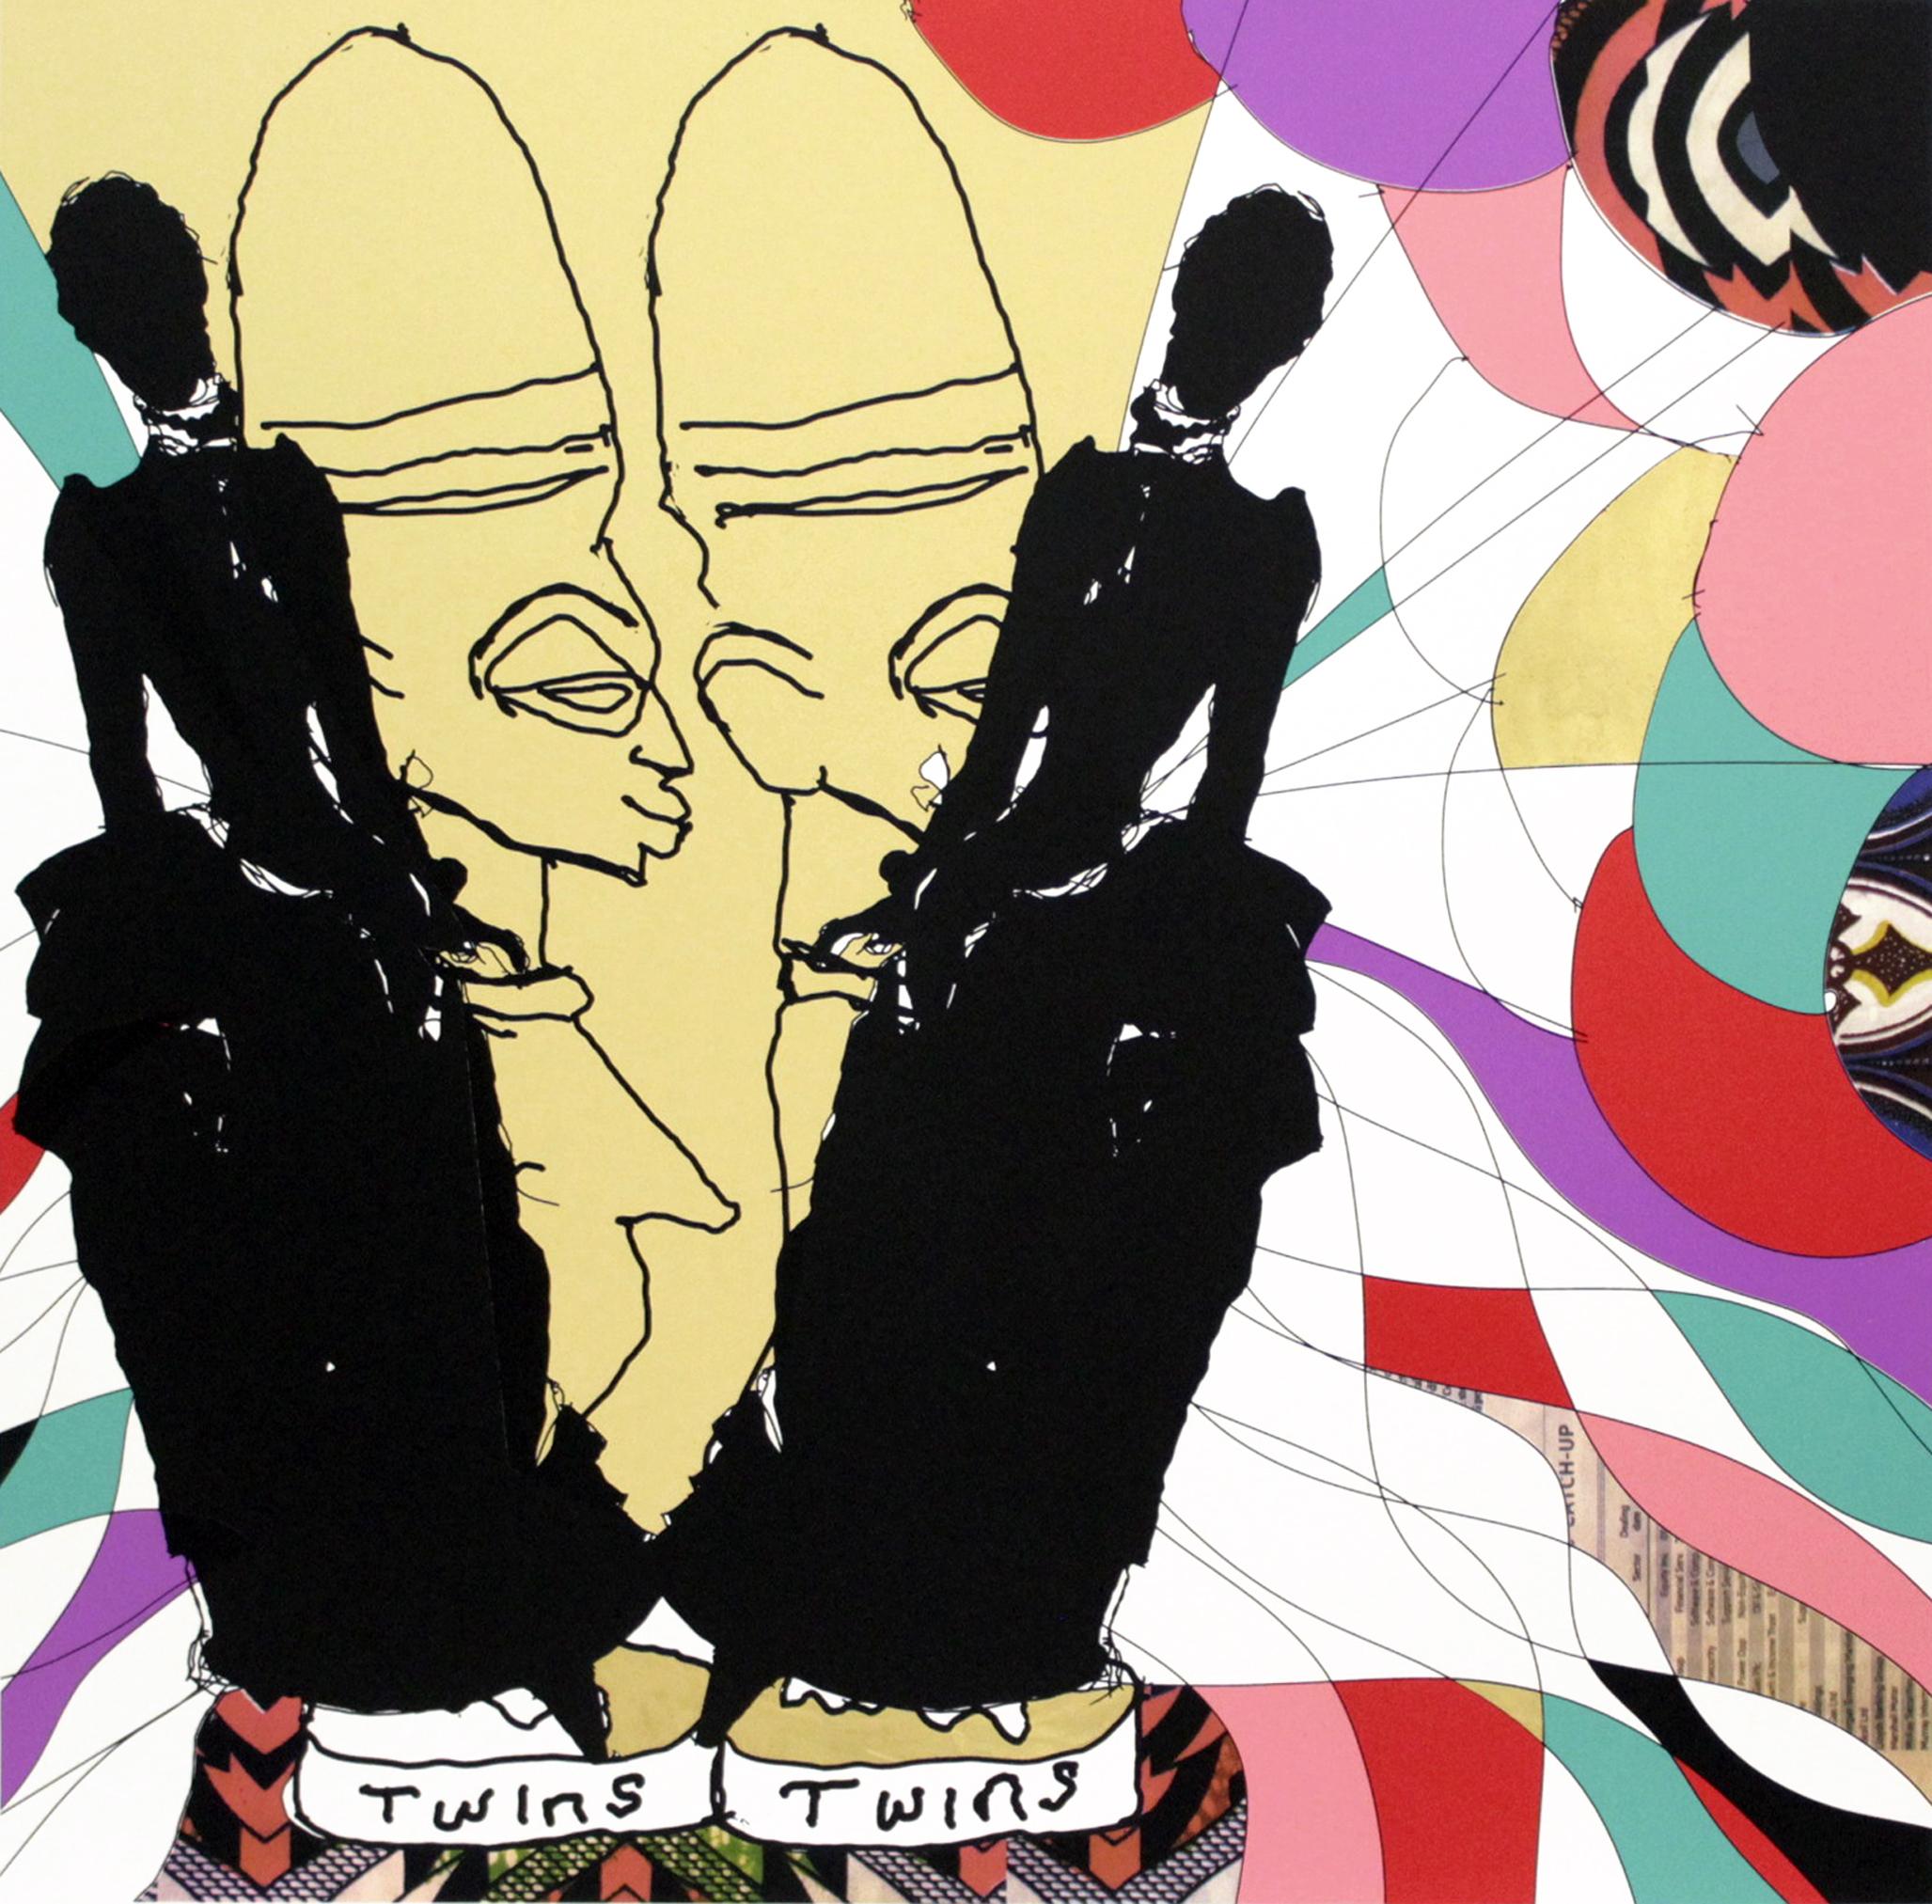 Print on show for Art X Lagos